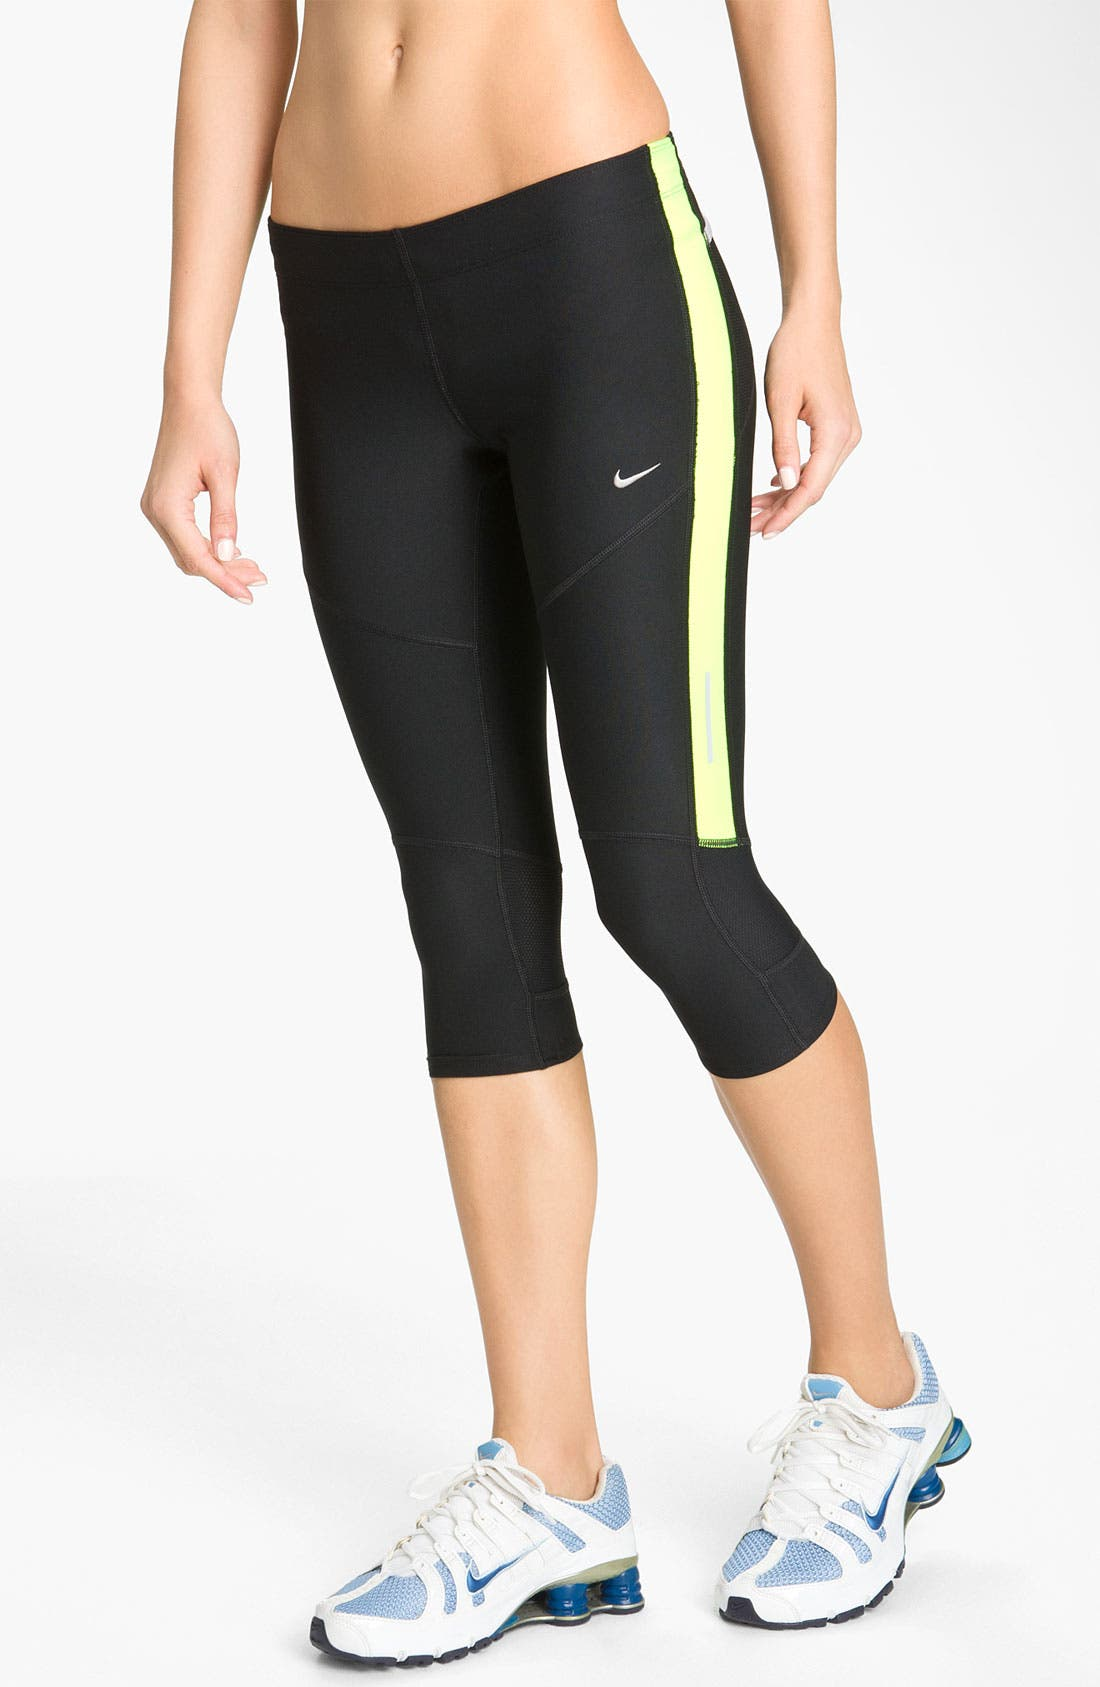 Alternate Image 1 Selected - Nike 'Tech' Running Capris